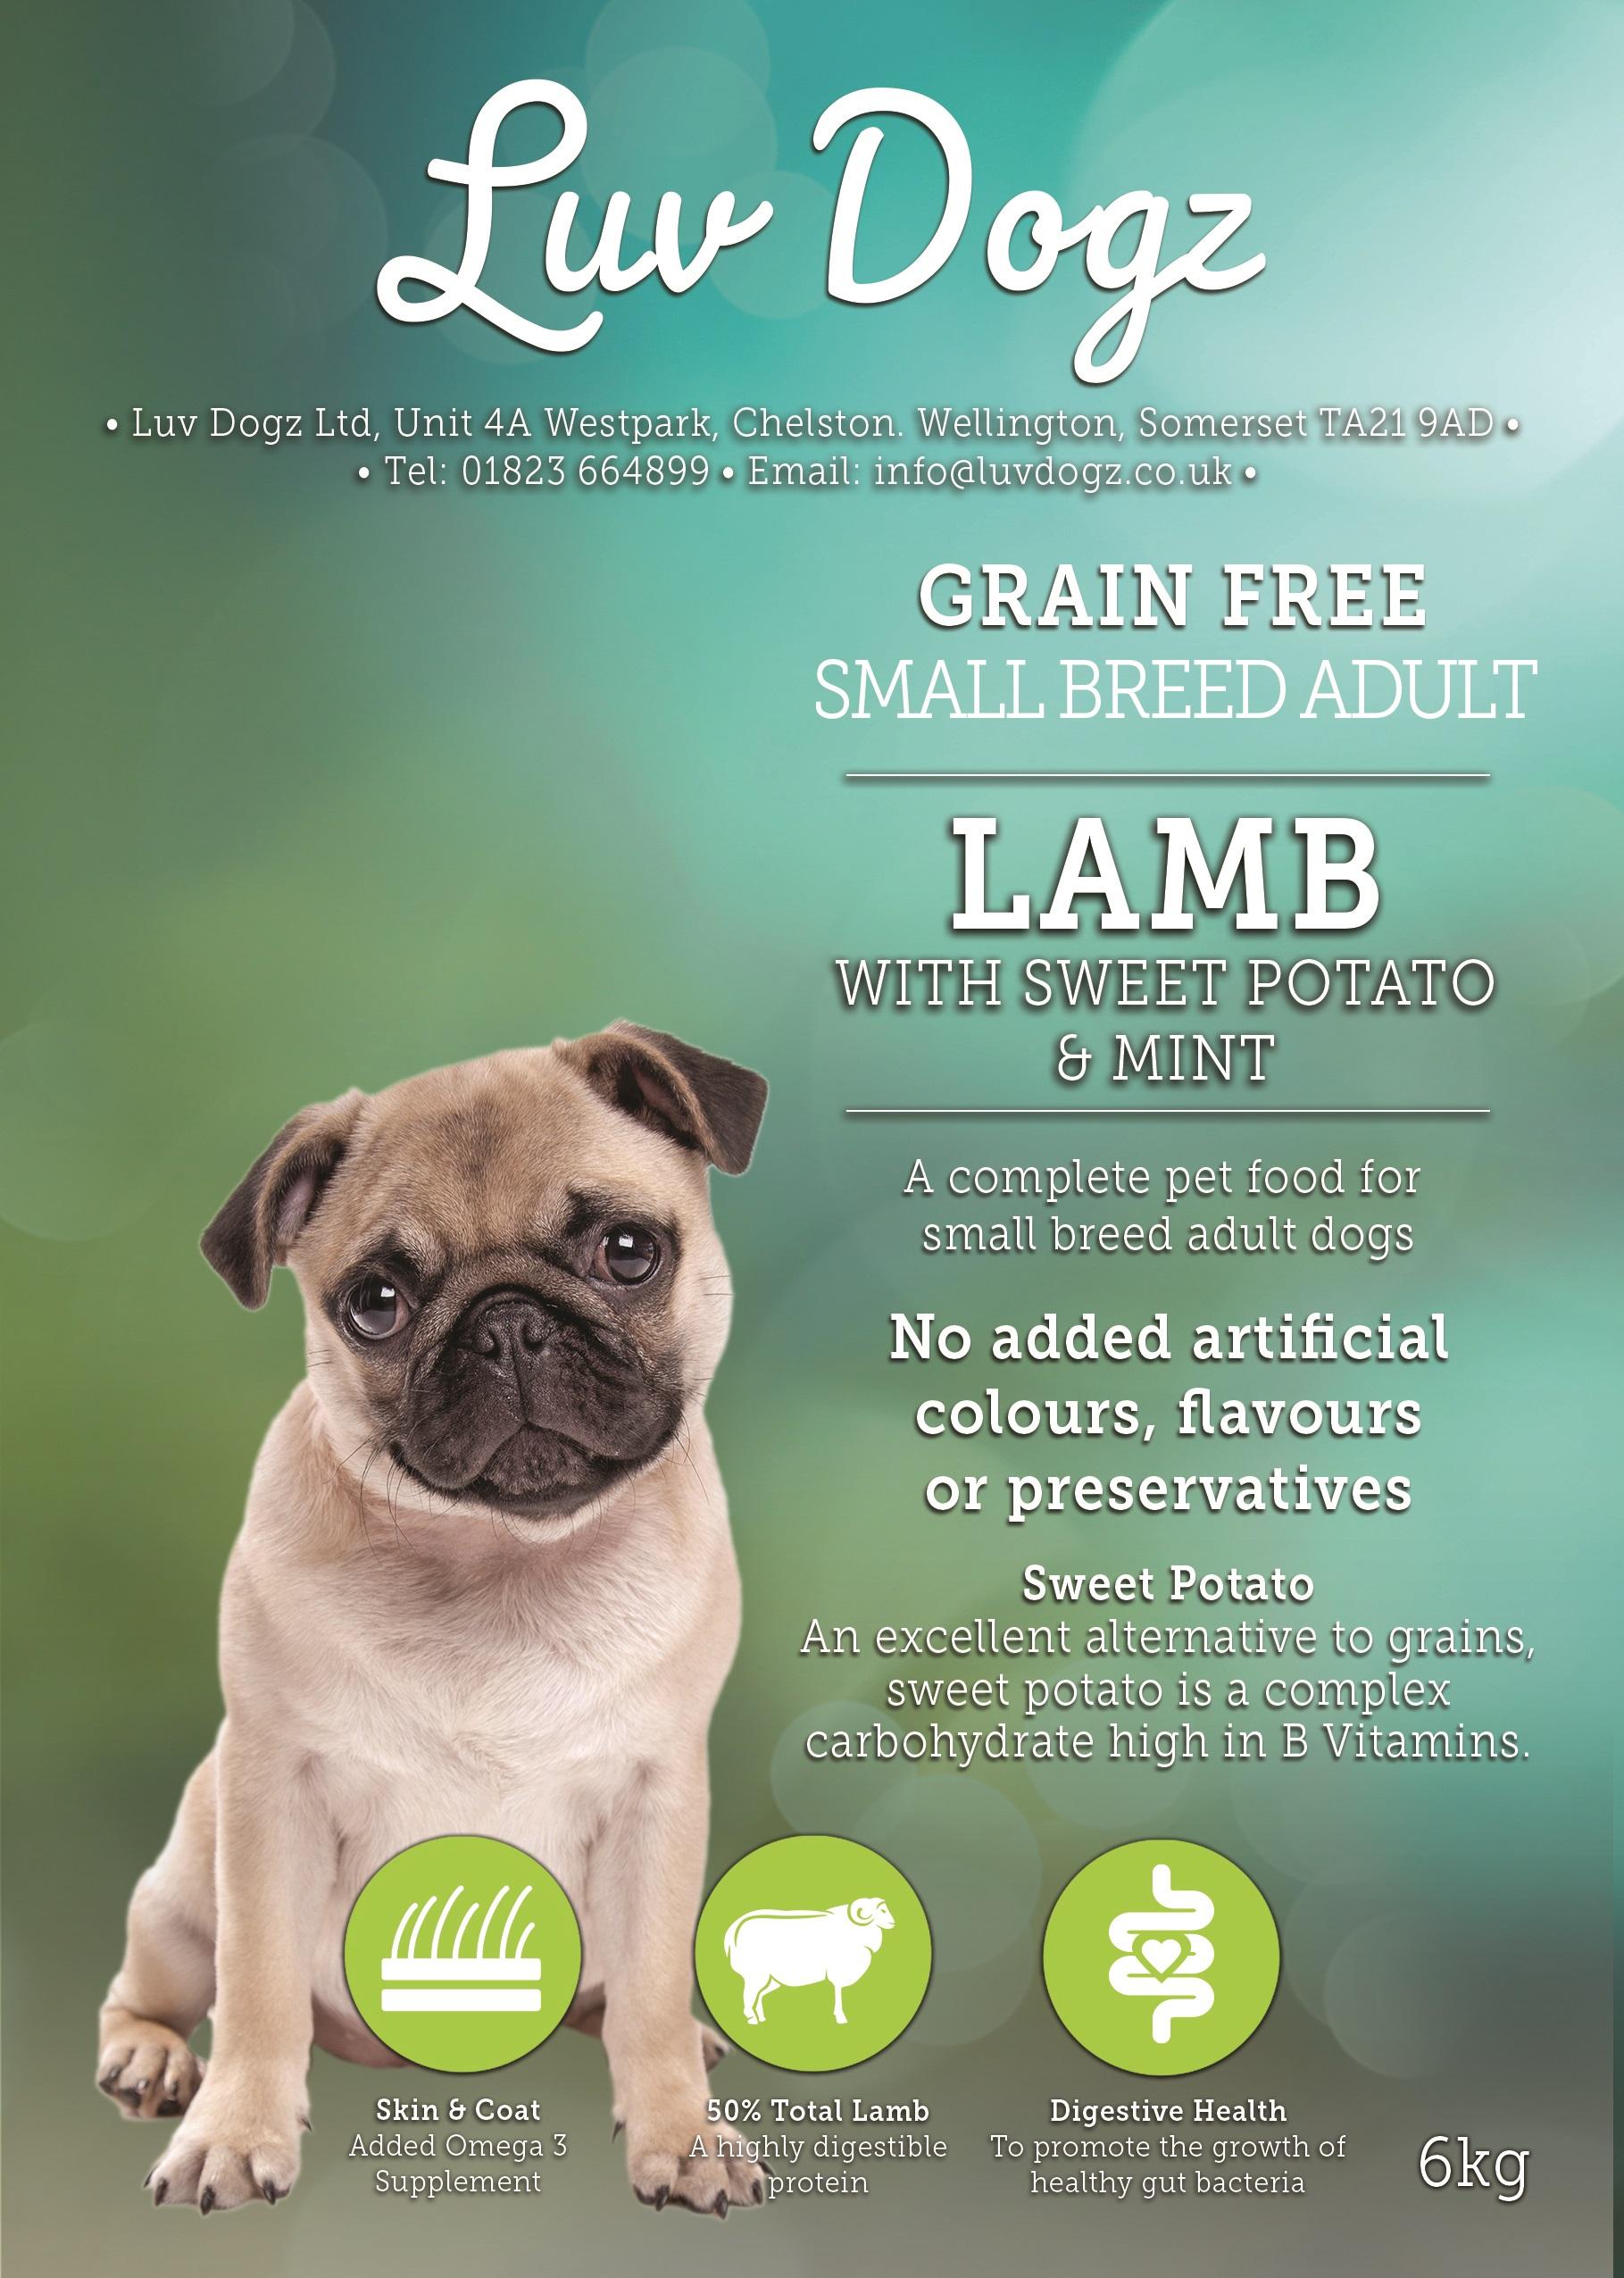 Small Breed Adult Lamb With Sweet Potato & Mint